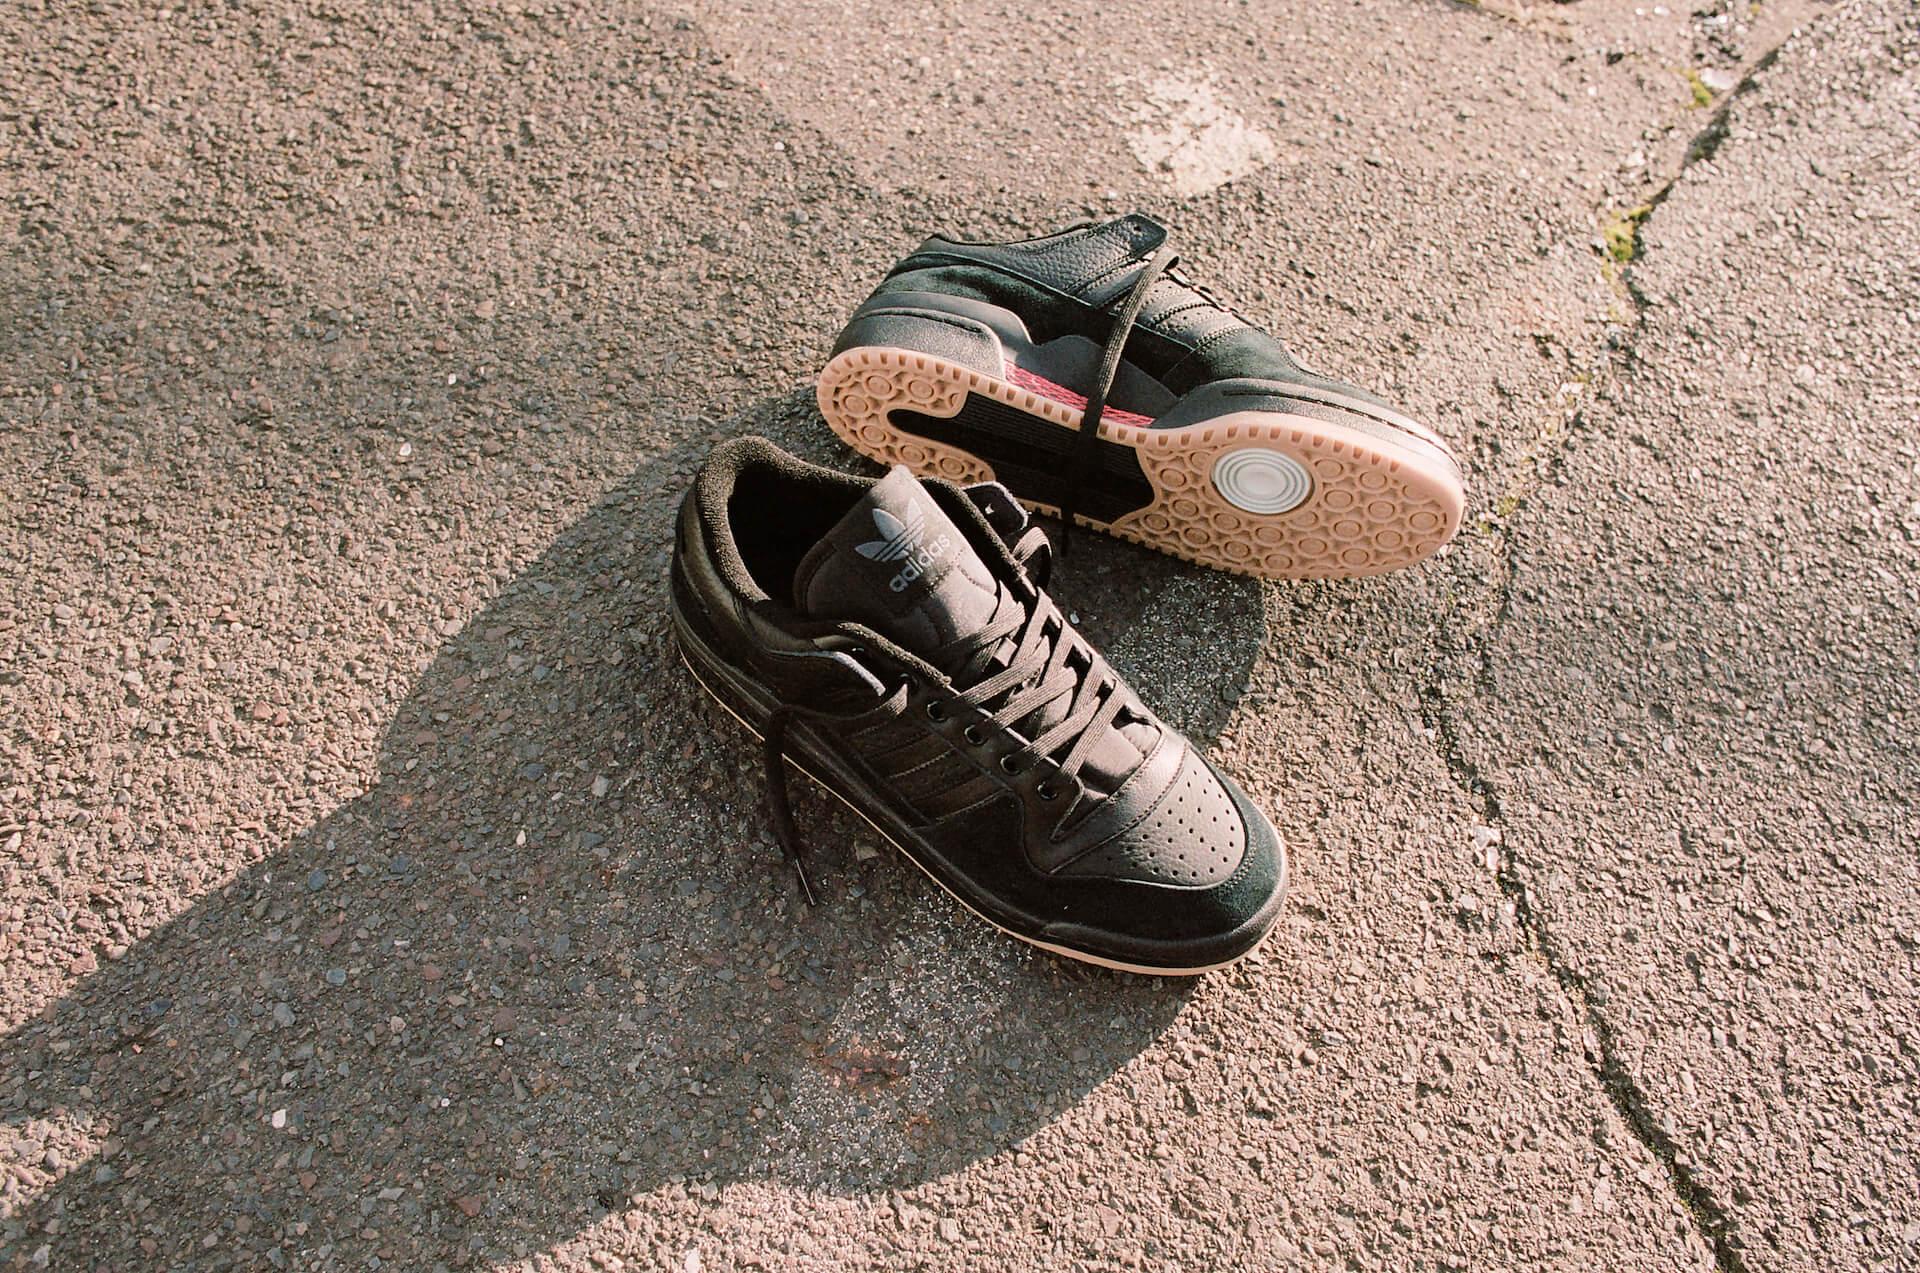 adidas Skateboarding「FORUM 84 ADV」に春夏仕様の新色が登場!チョークホワイト&ブラックの2色 life210324_adidasskateboarding_10